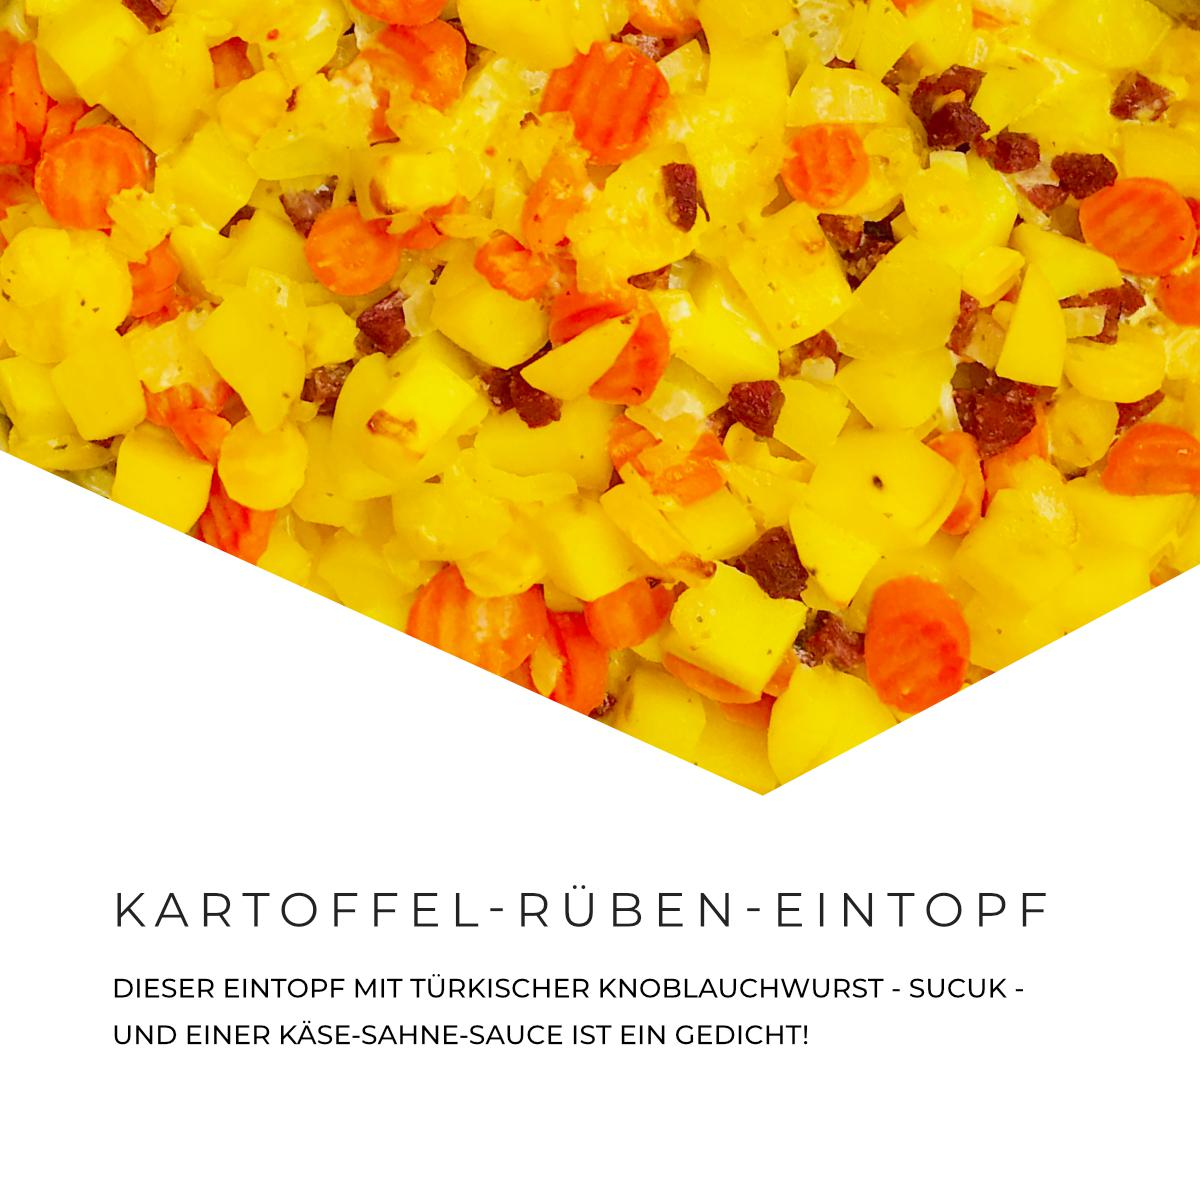 KARTOFFEL-RUEBEN-EINTOPF